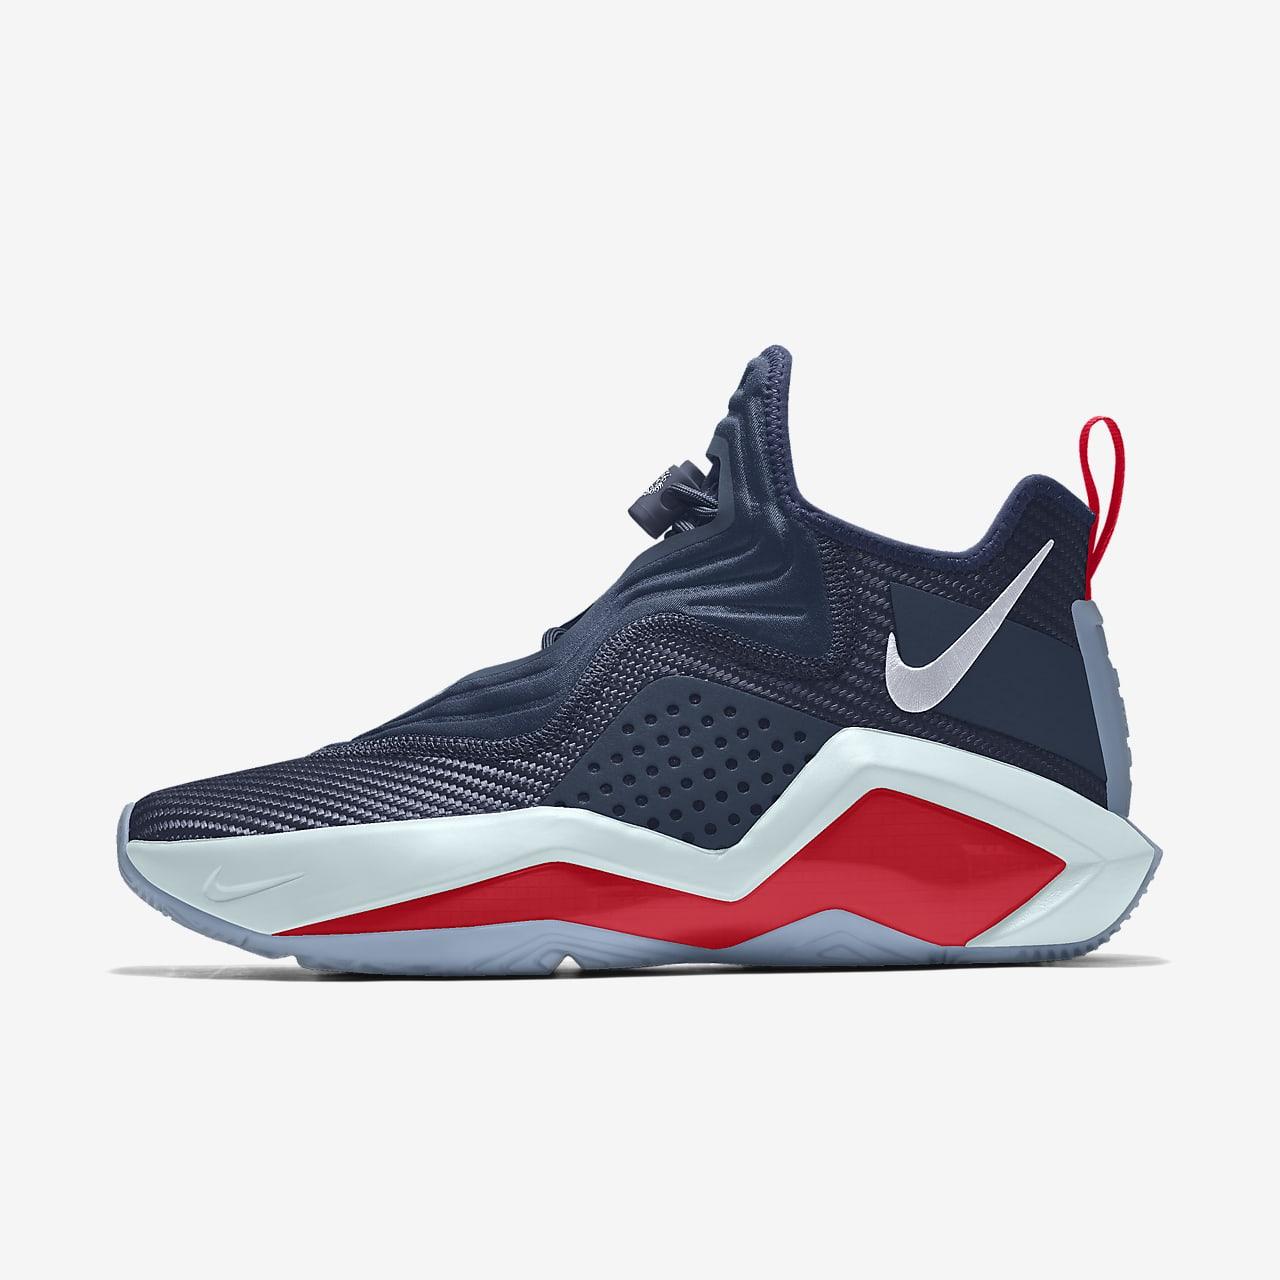 Scarpa da basket personalizzabile LeBron Soldier 14 By You